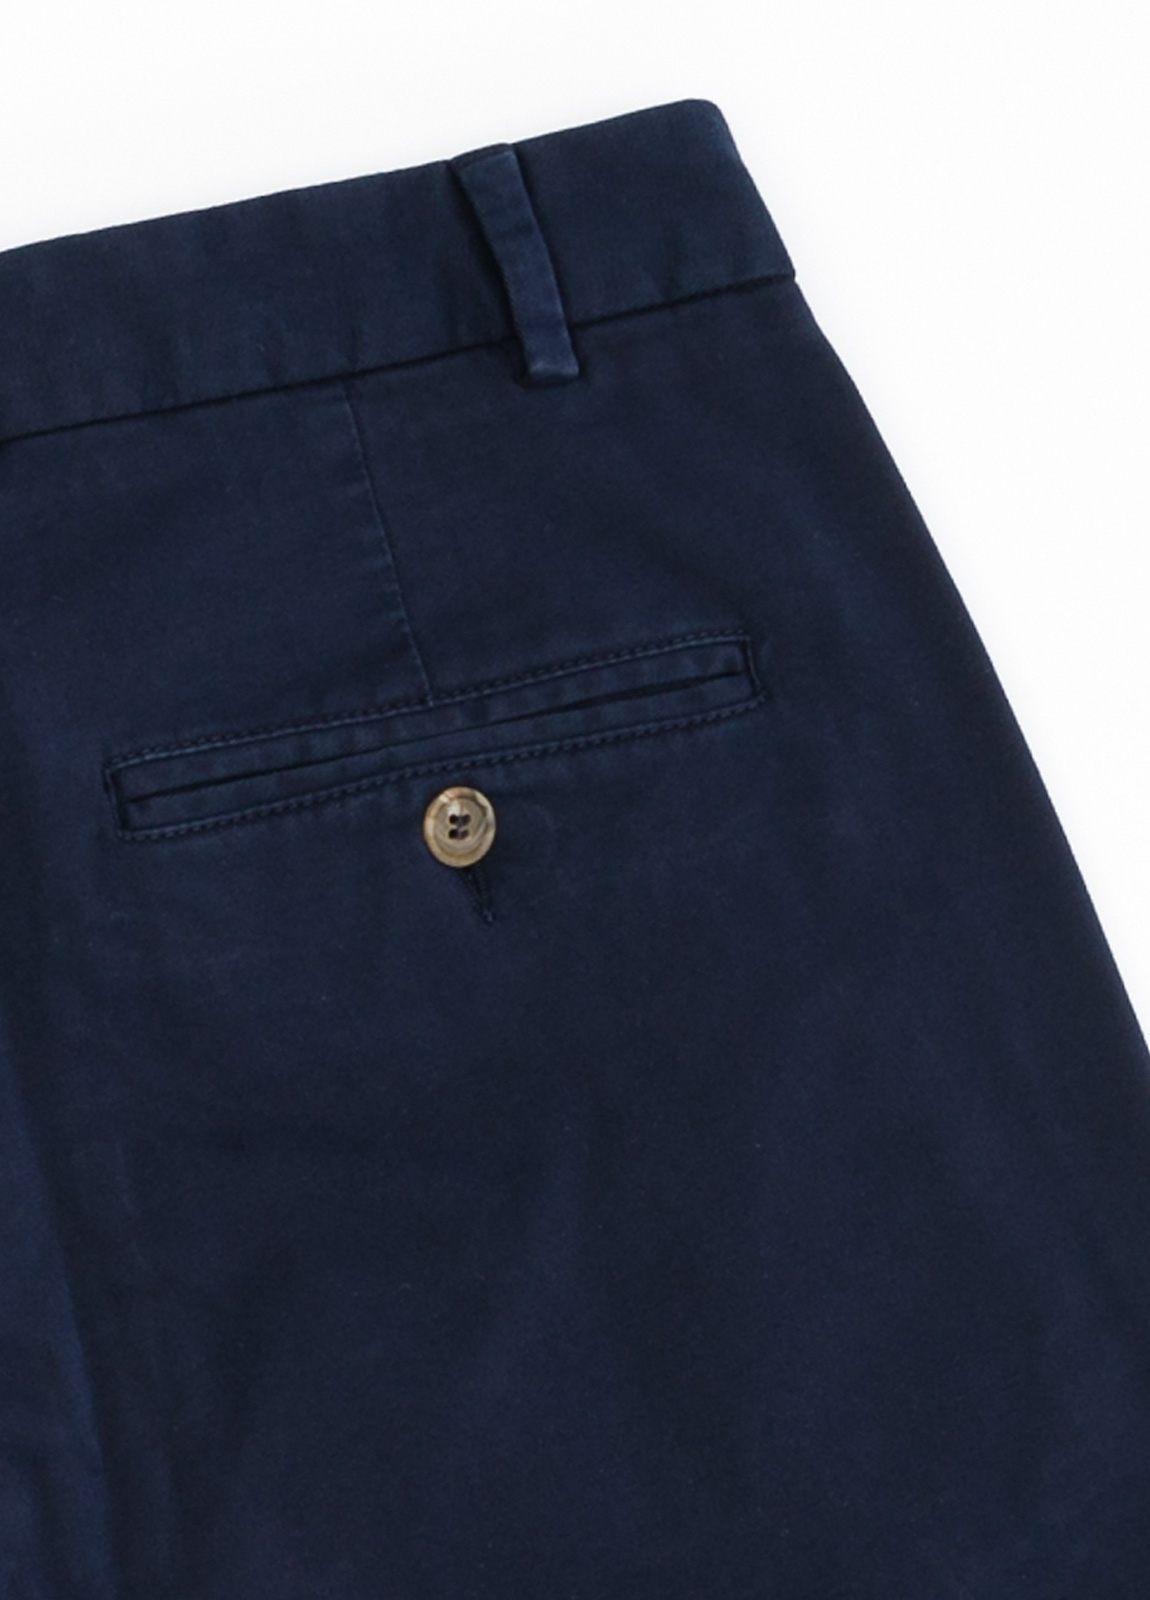 Pantalón Casual Wear, SLIM FIT micro textura color azul marino, 98% Algodón 2% Elastano. - Ítem1